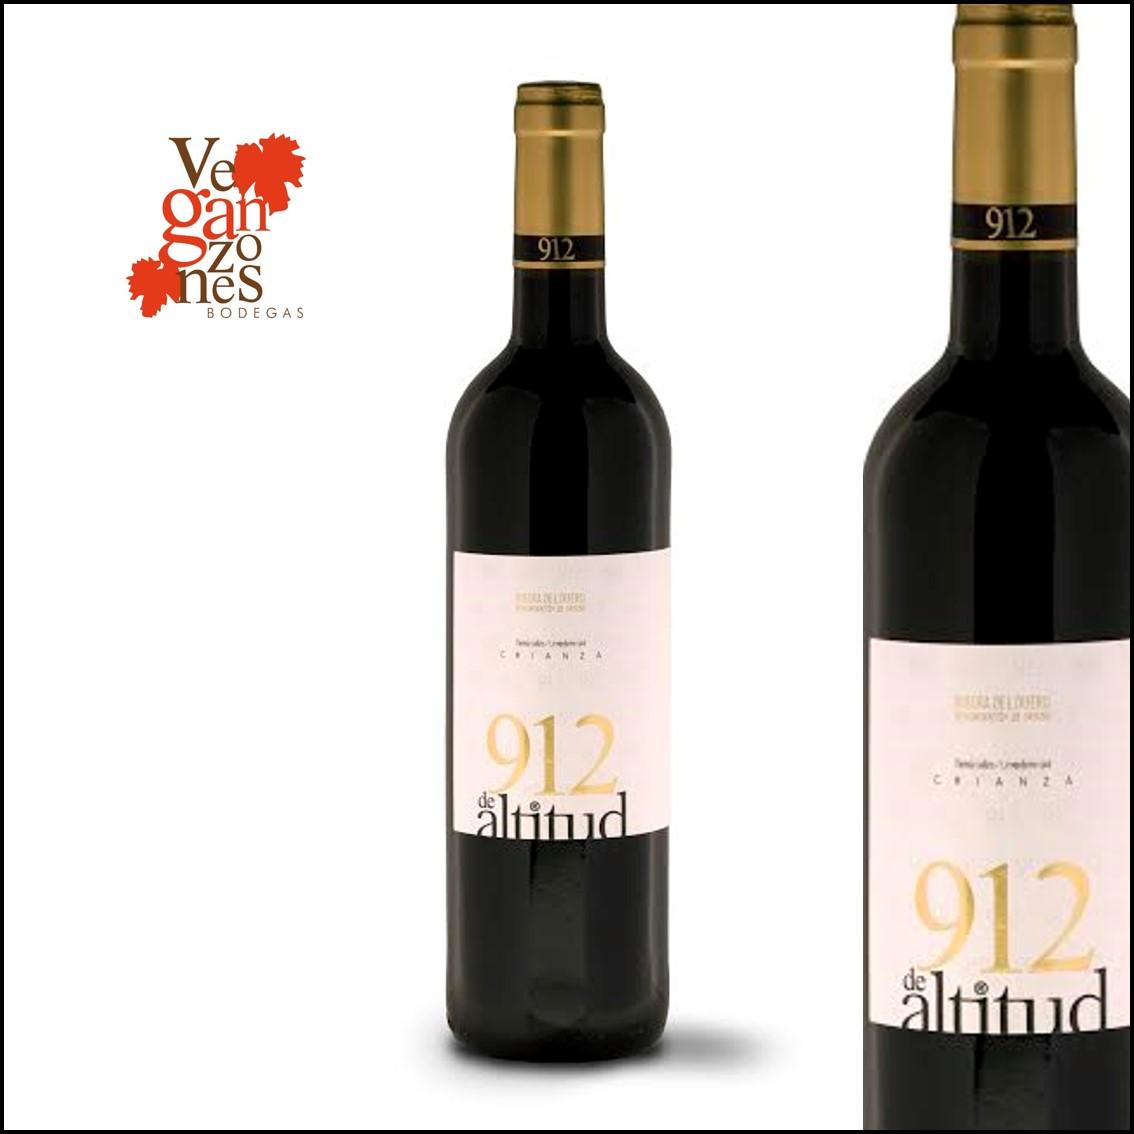 Veganzones «912 de Altitud» Tierra Caliza D.O. Ribera de Duero